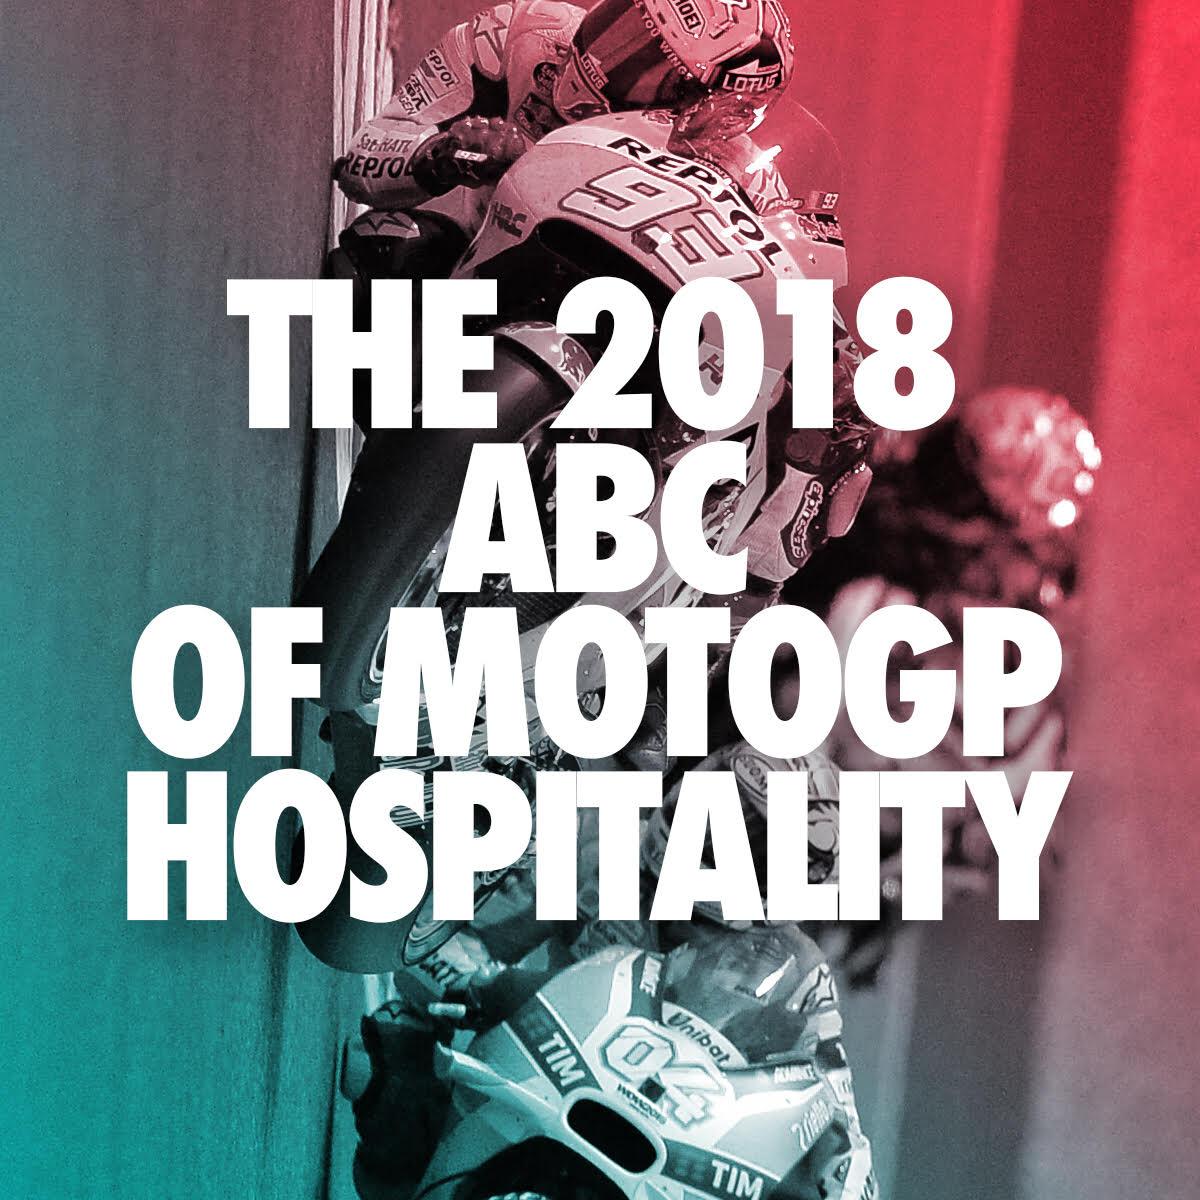 2018 motogp hospitality